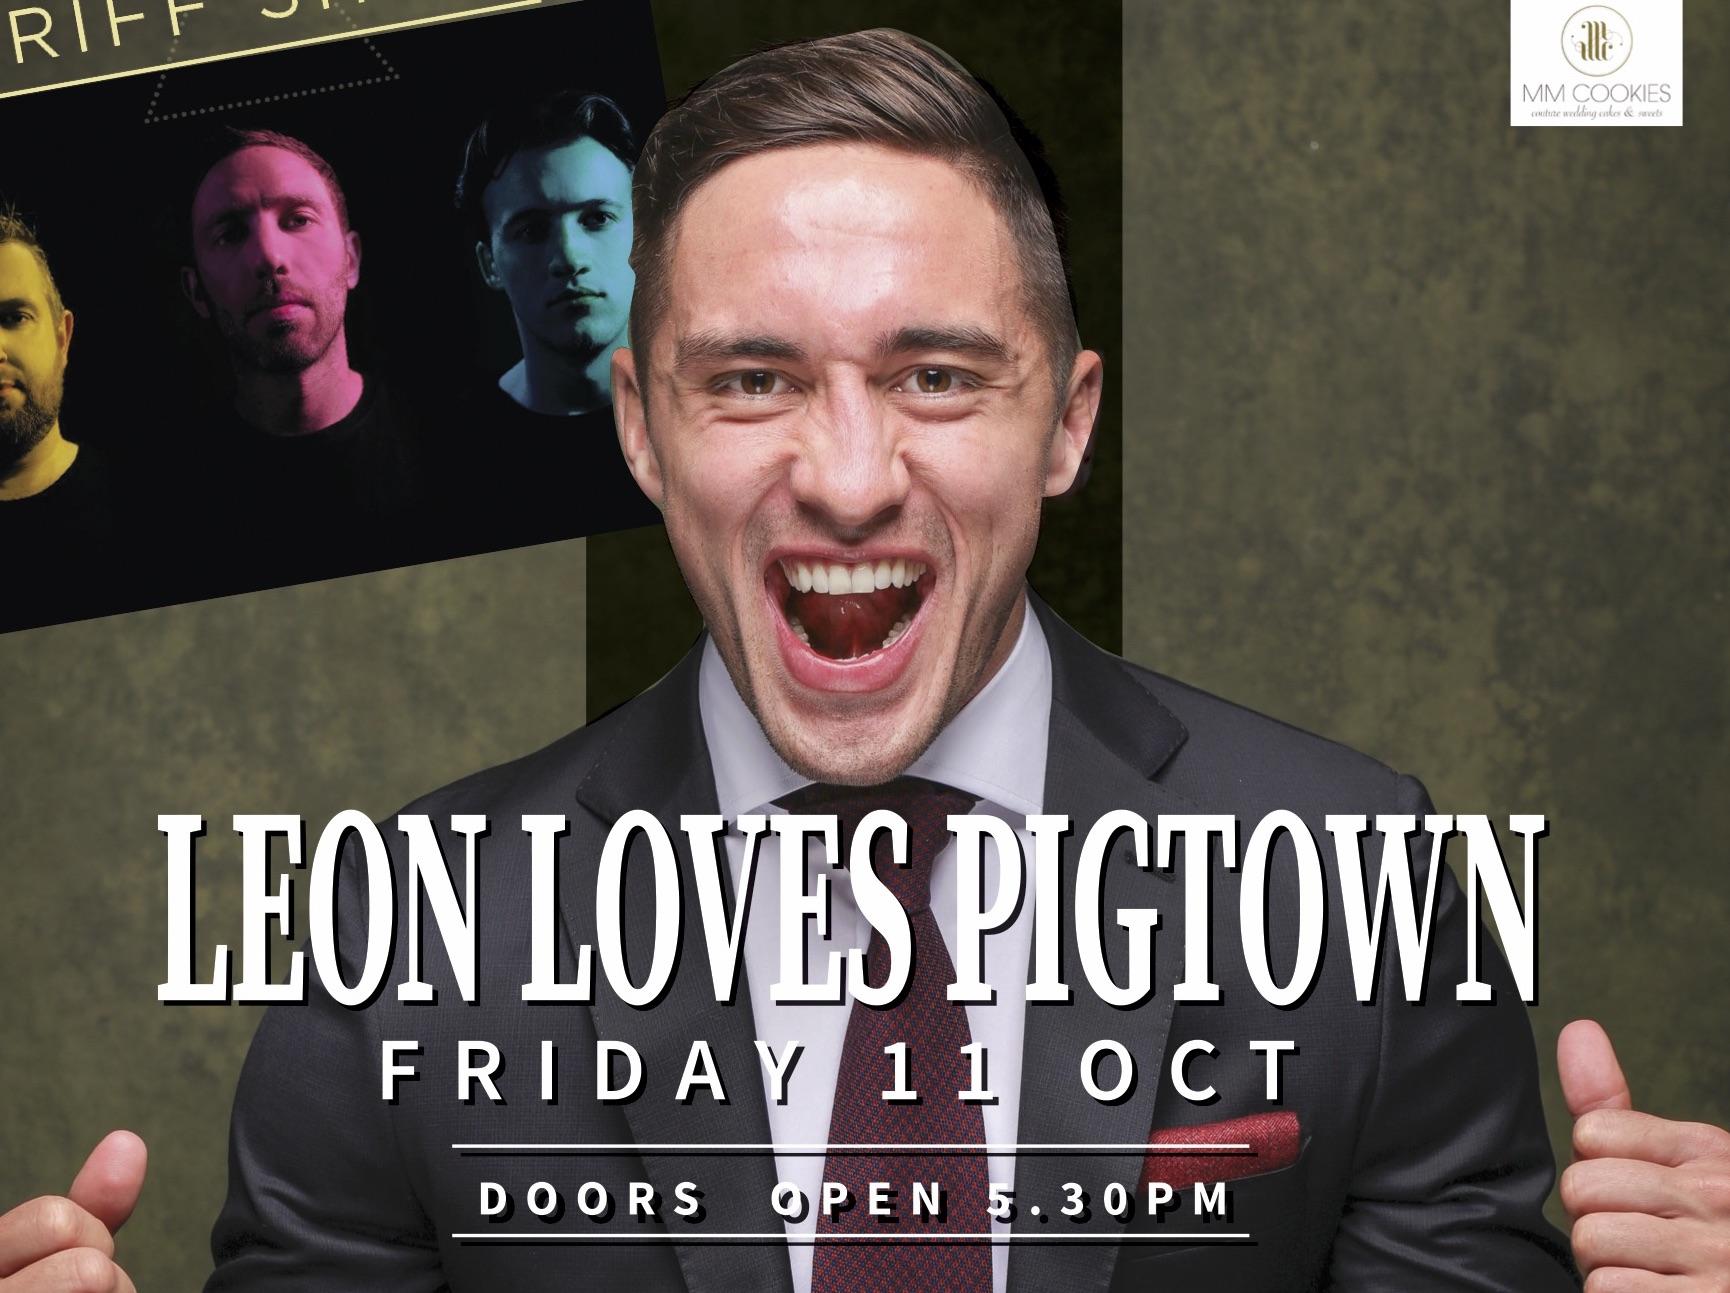 Leon loves Pigtown